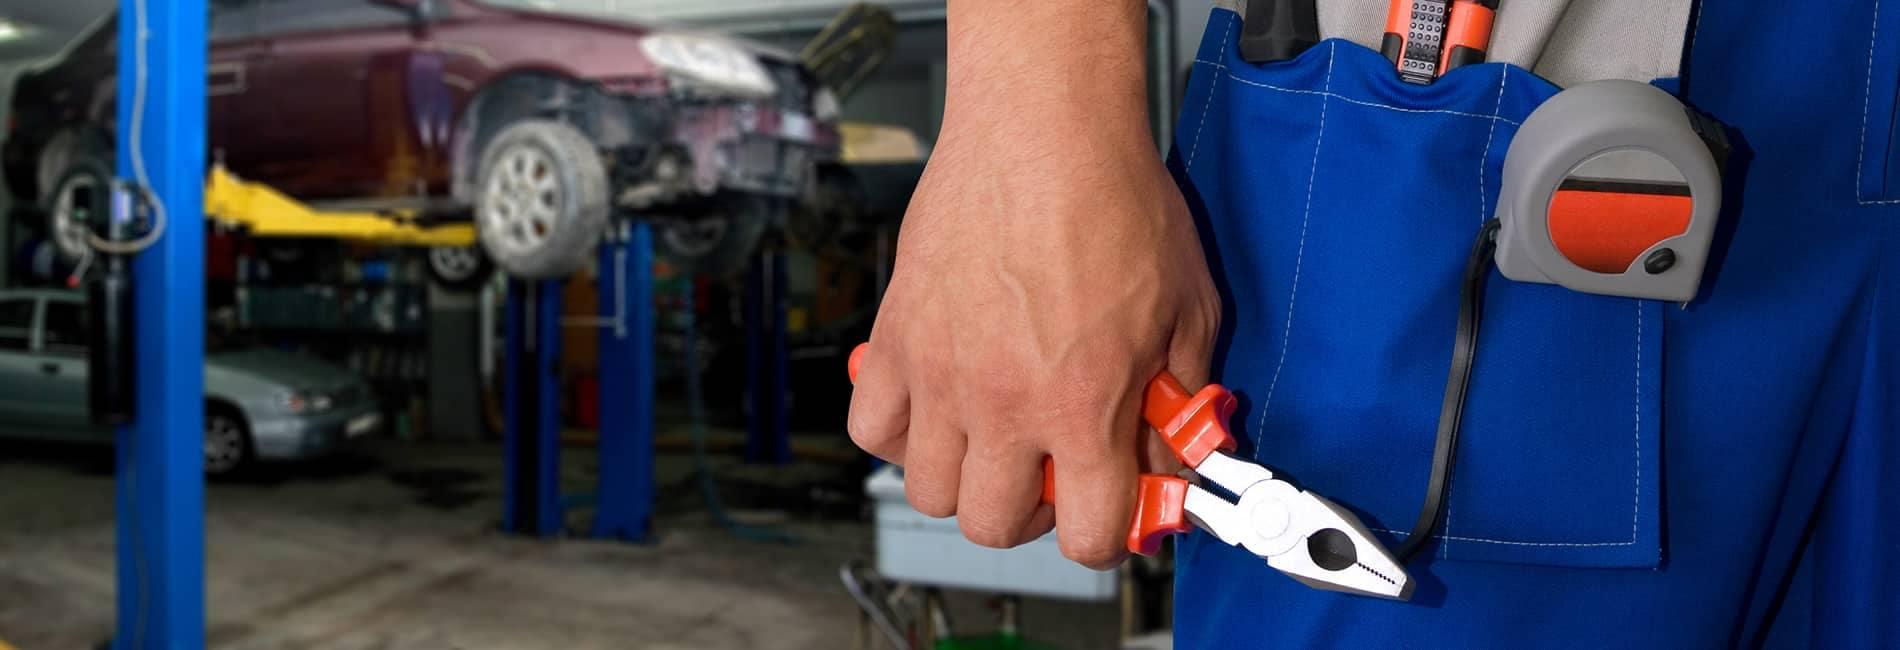 Service Technician holding a tool